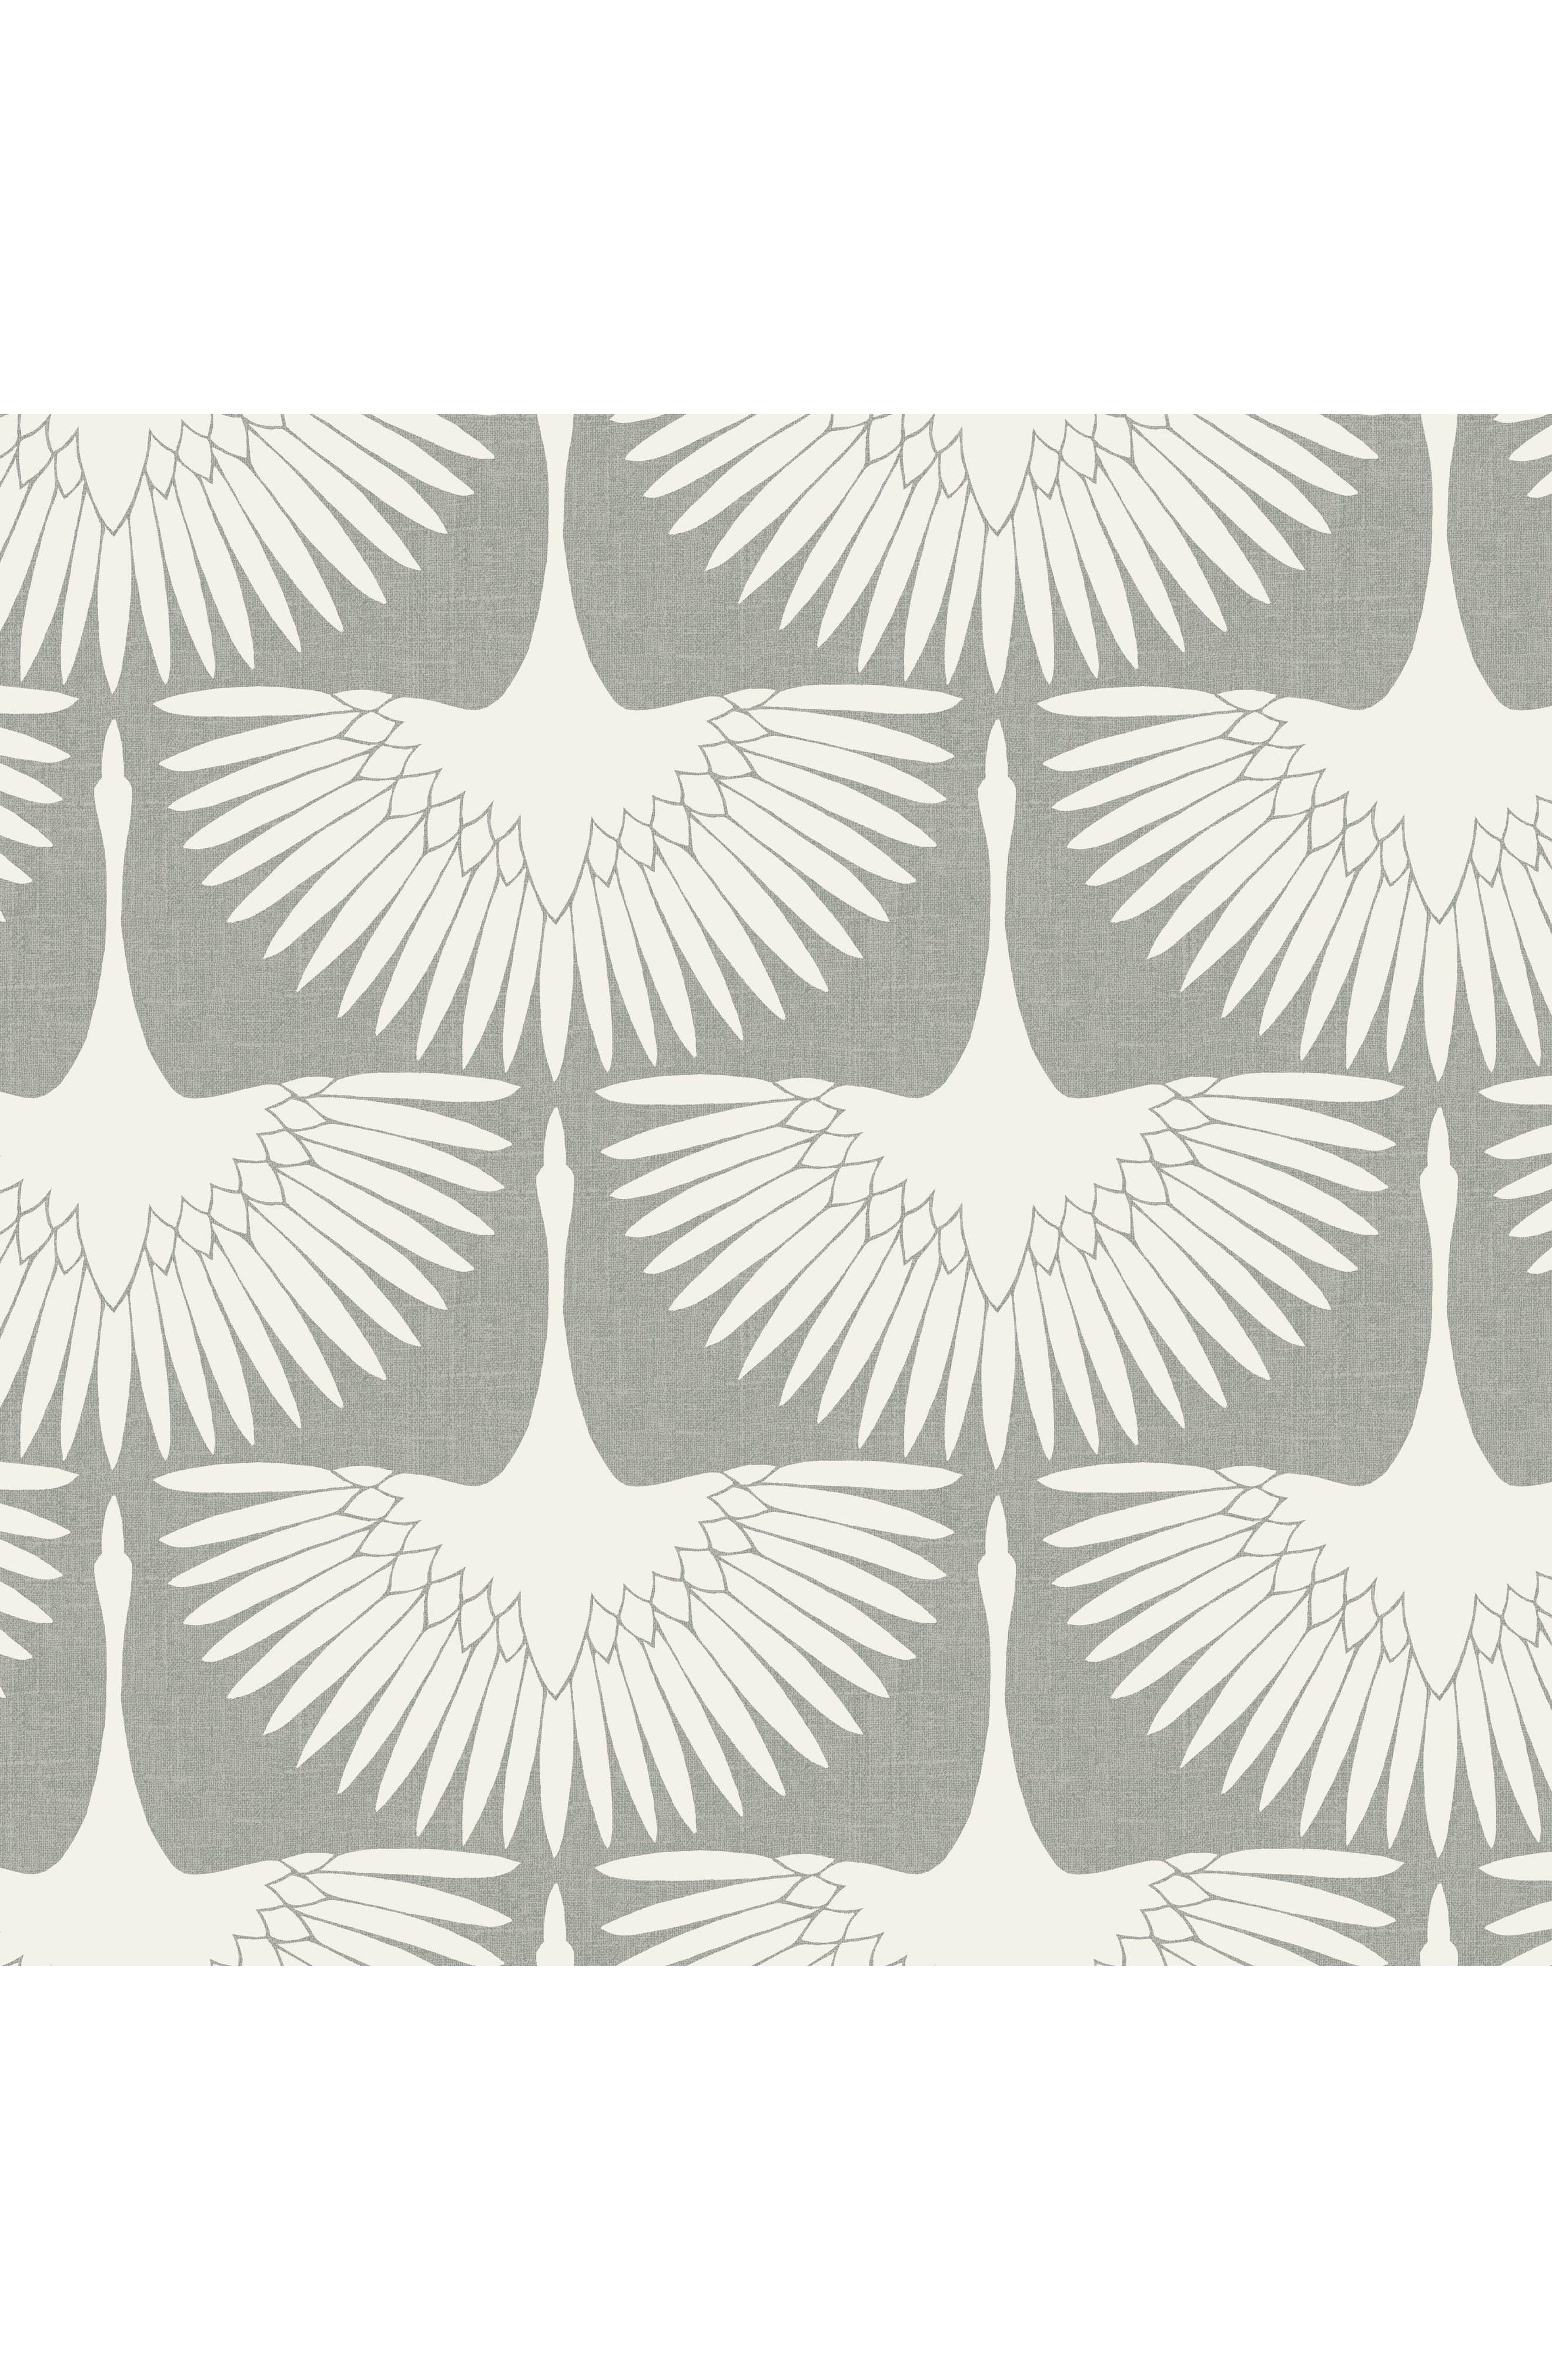 Main Image - Tempaper Feather Flock Vinyl Wallpaper